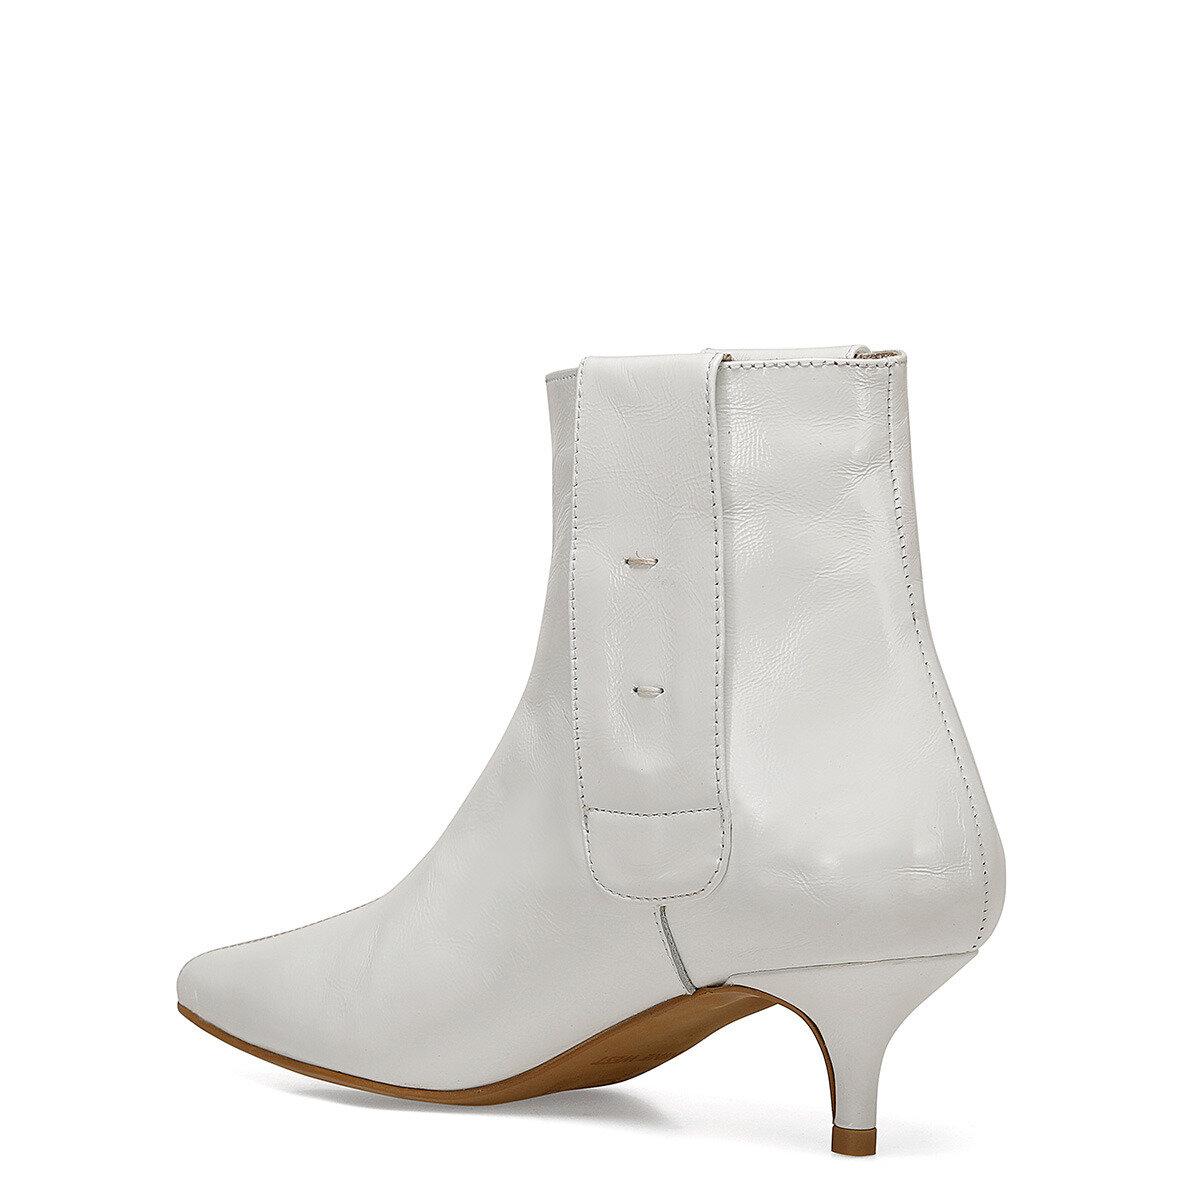 SHINE Beyaz Kadın Topuklu Bot